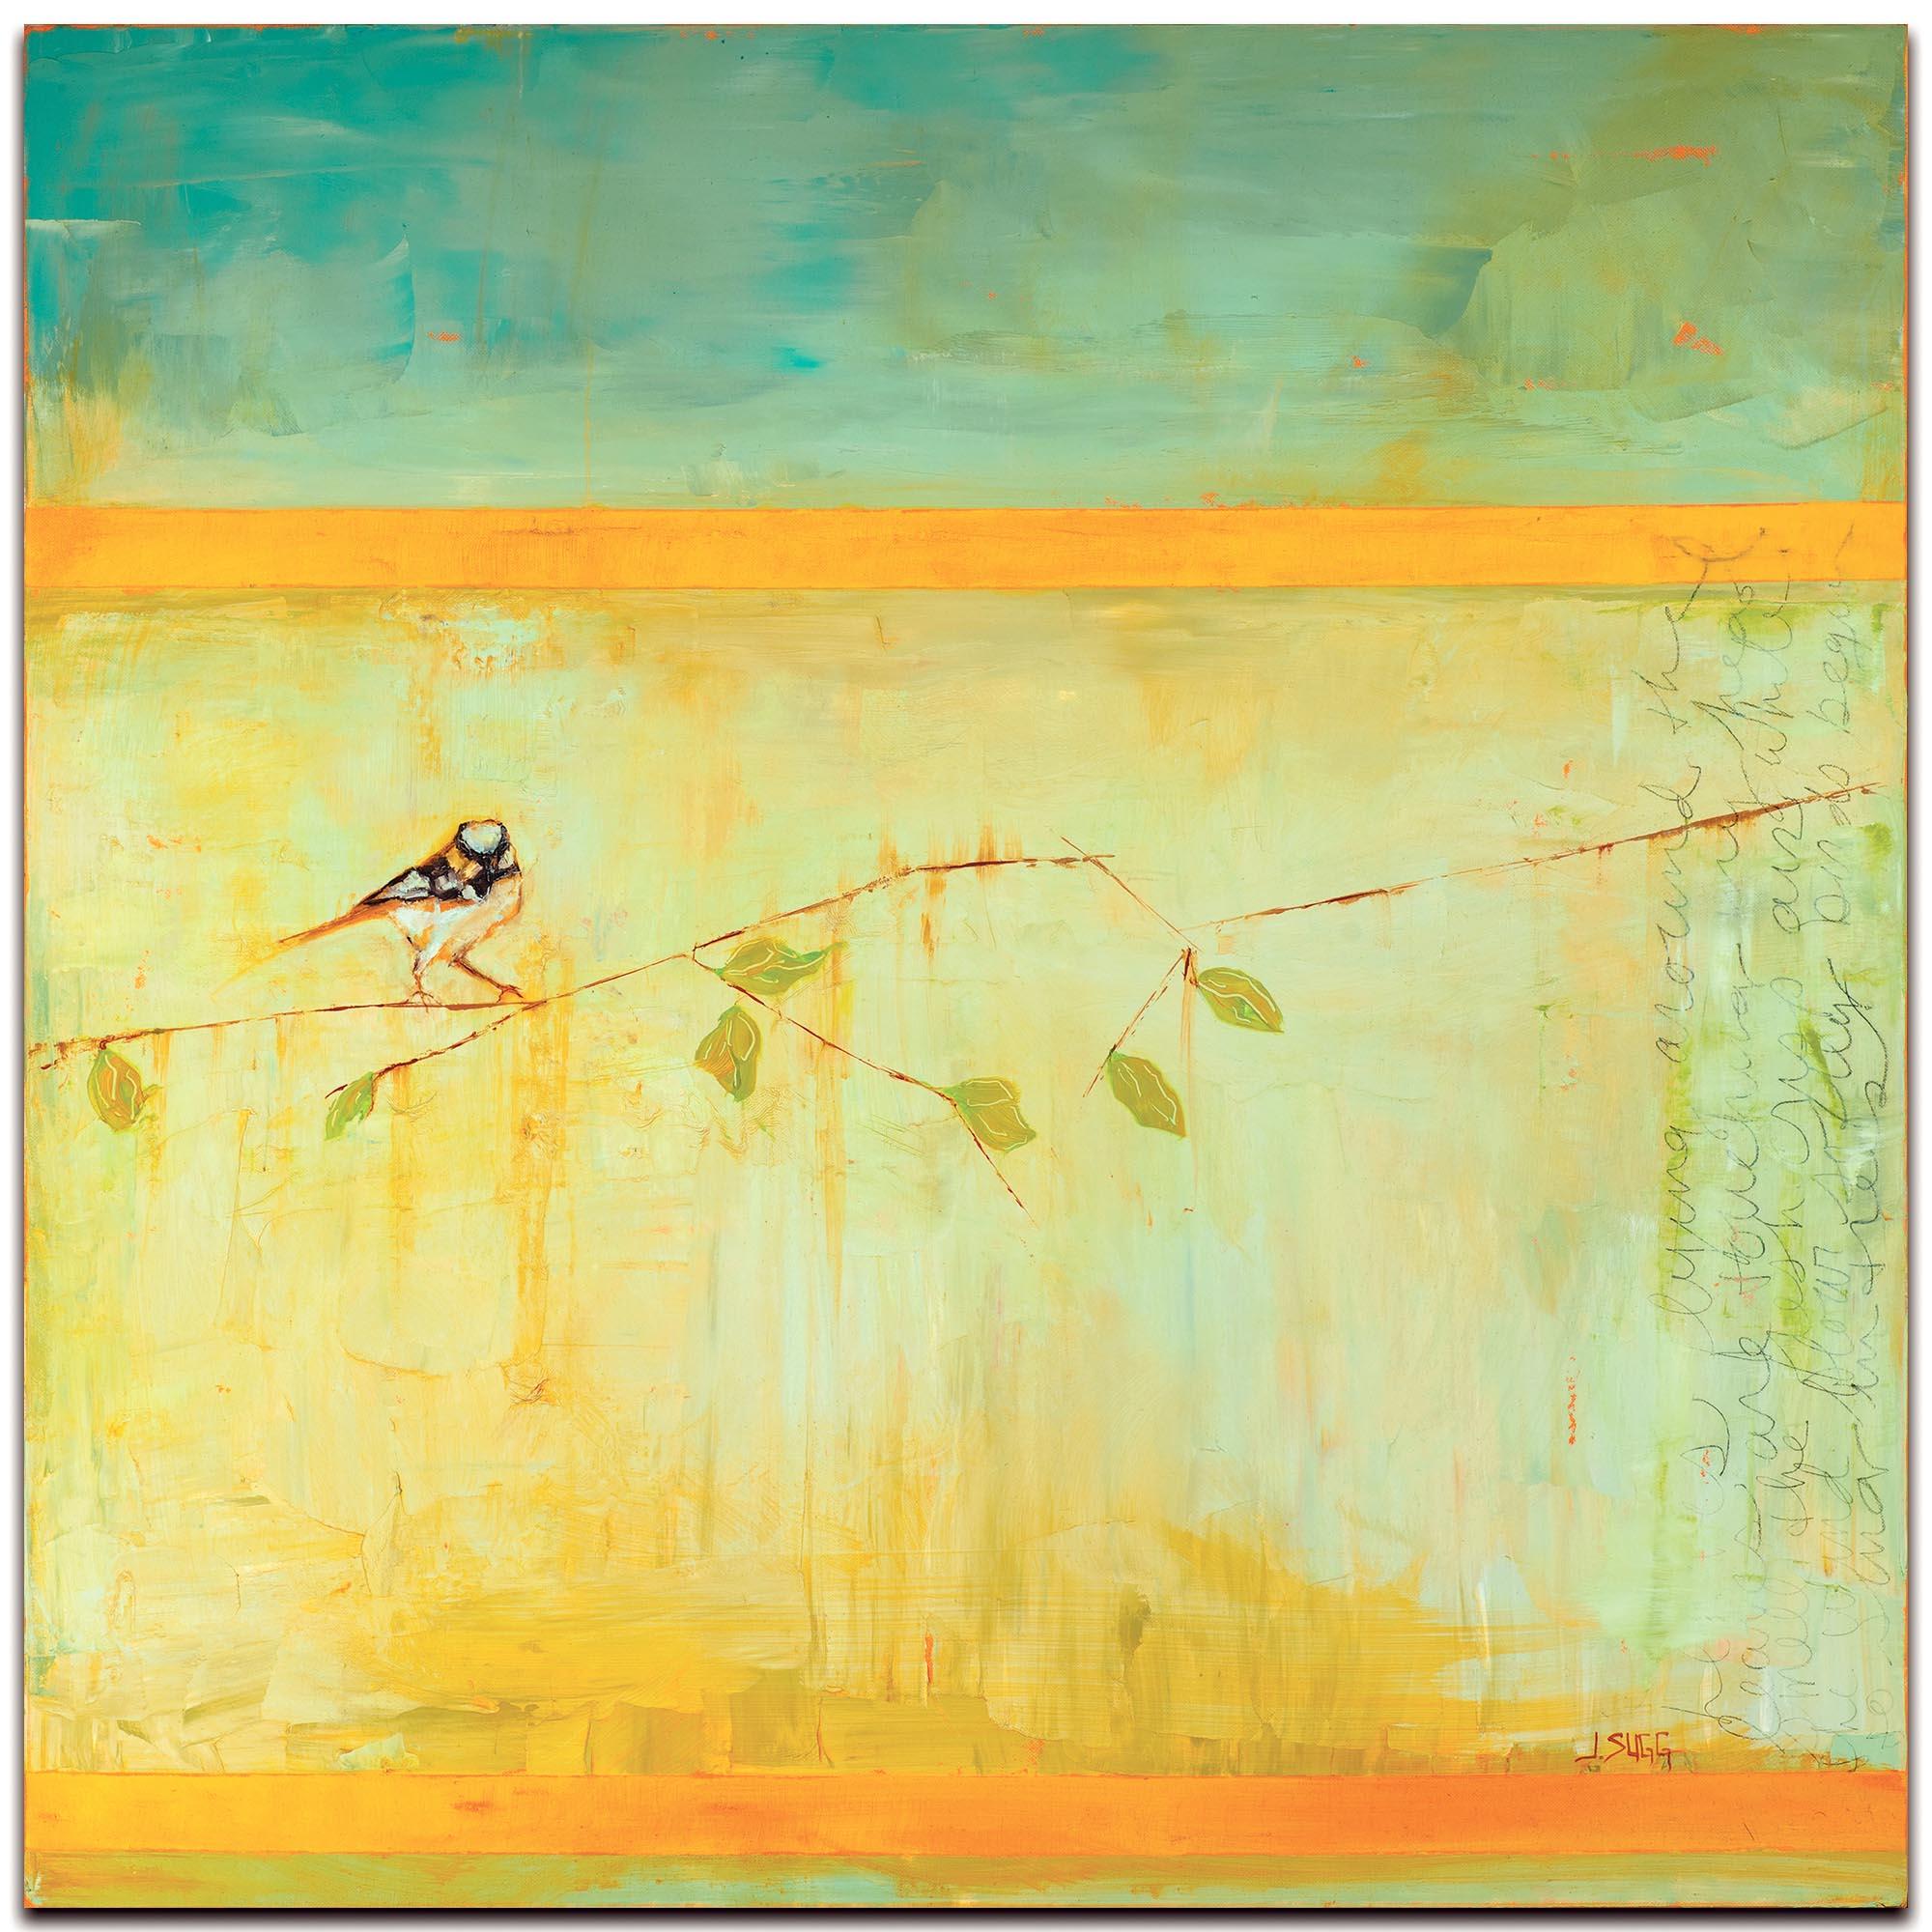 Contemporary Wall Art 'Bird with Horizontal Stripes' - Urban Birds Decor on Metal or Plexiglass